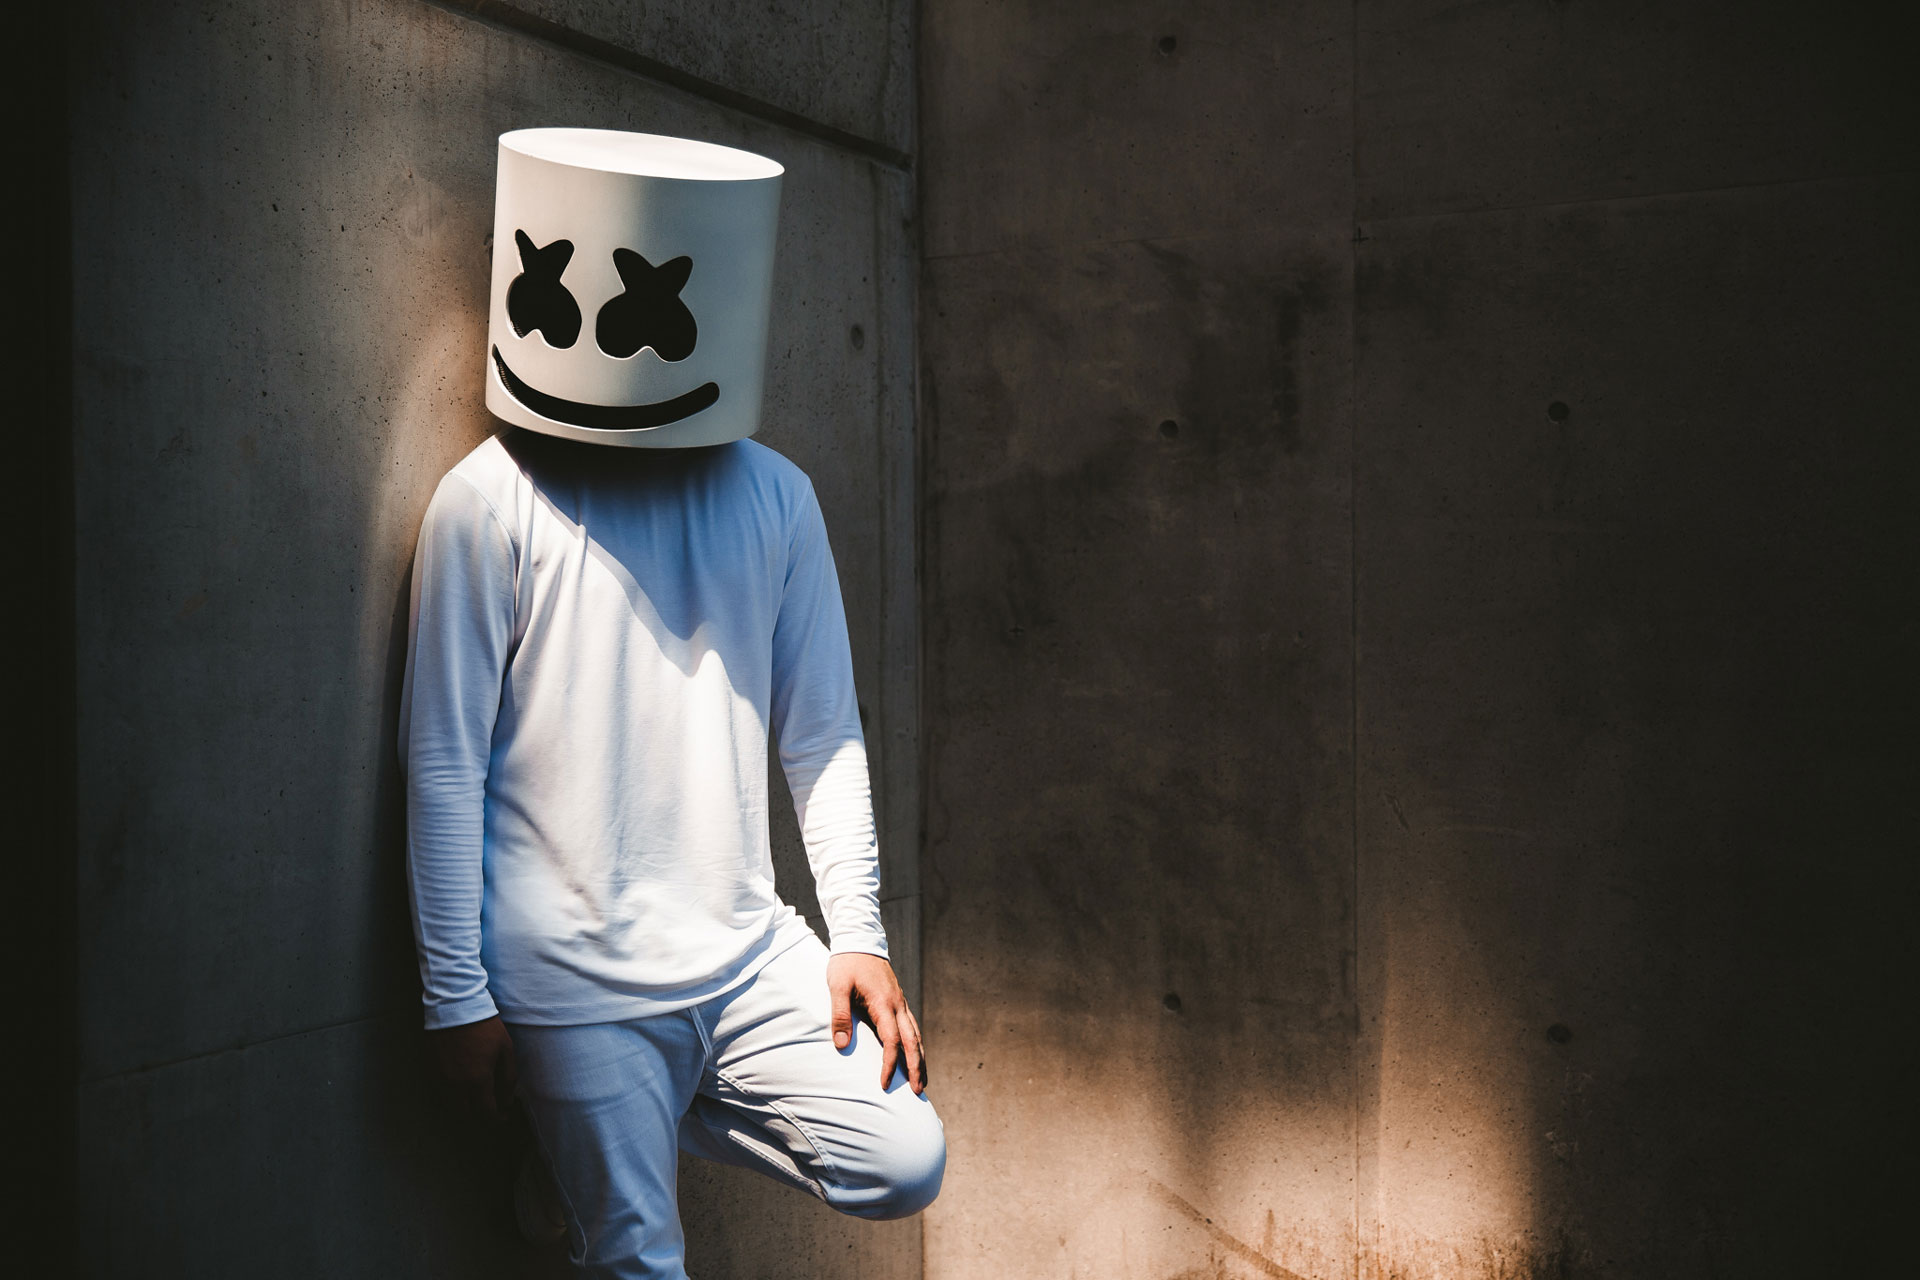 Marshmello Alone 2048x1152 Resolution